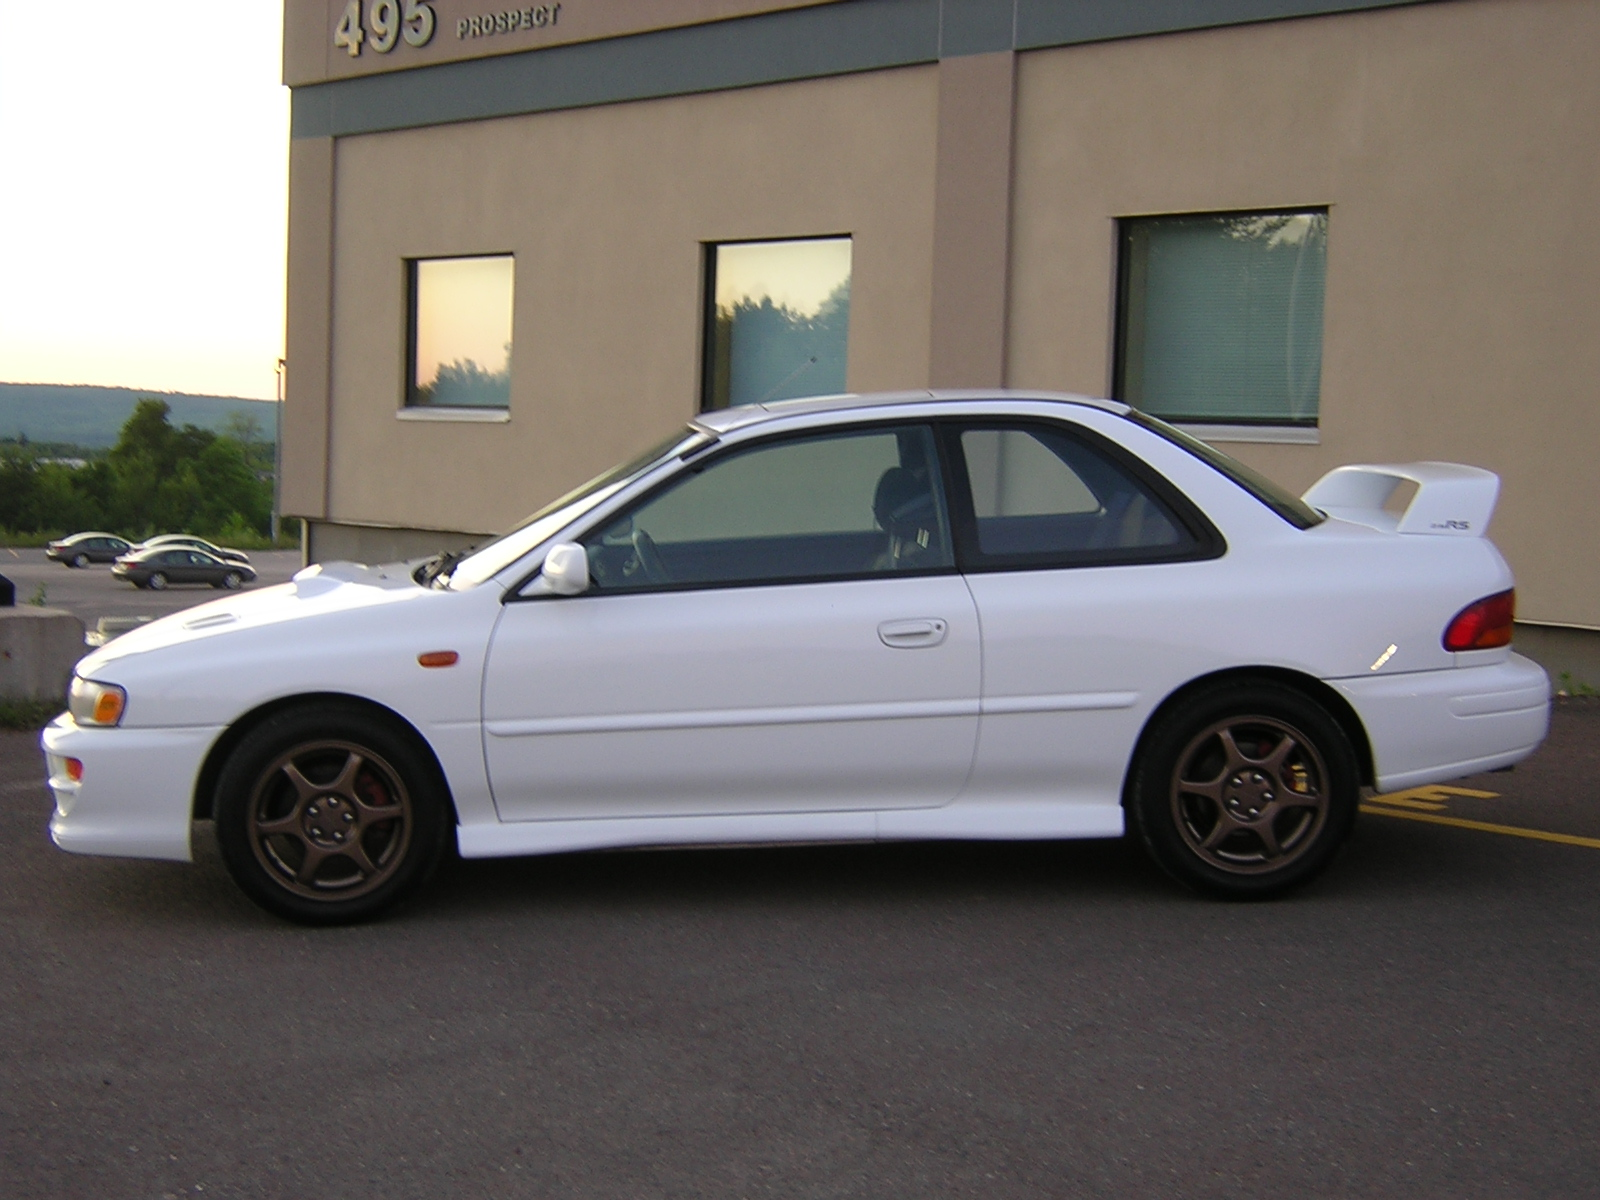 2000 Subaru Impreza Other Pictures Cargurus